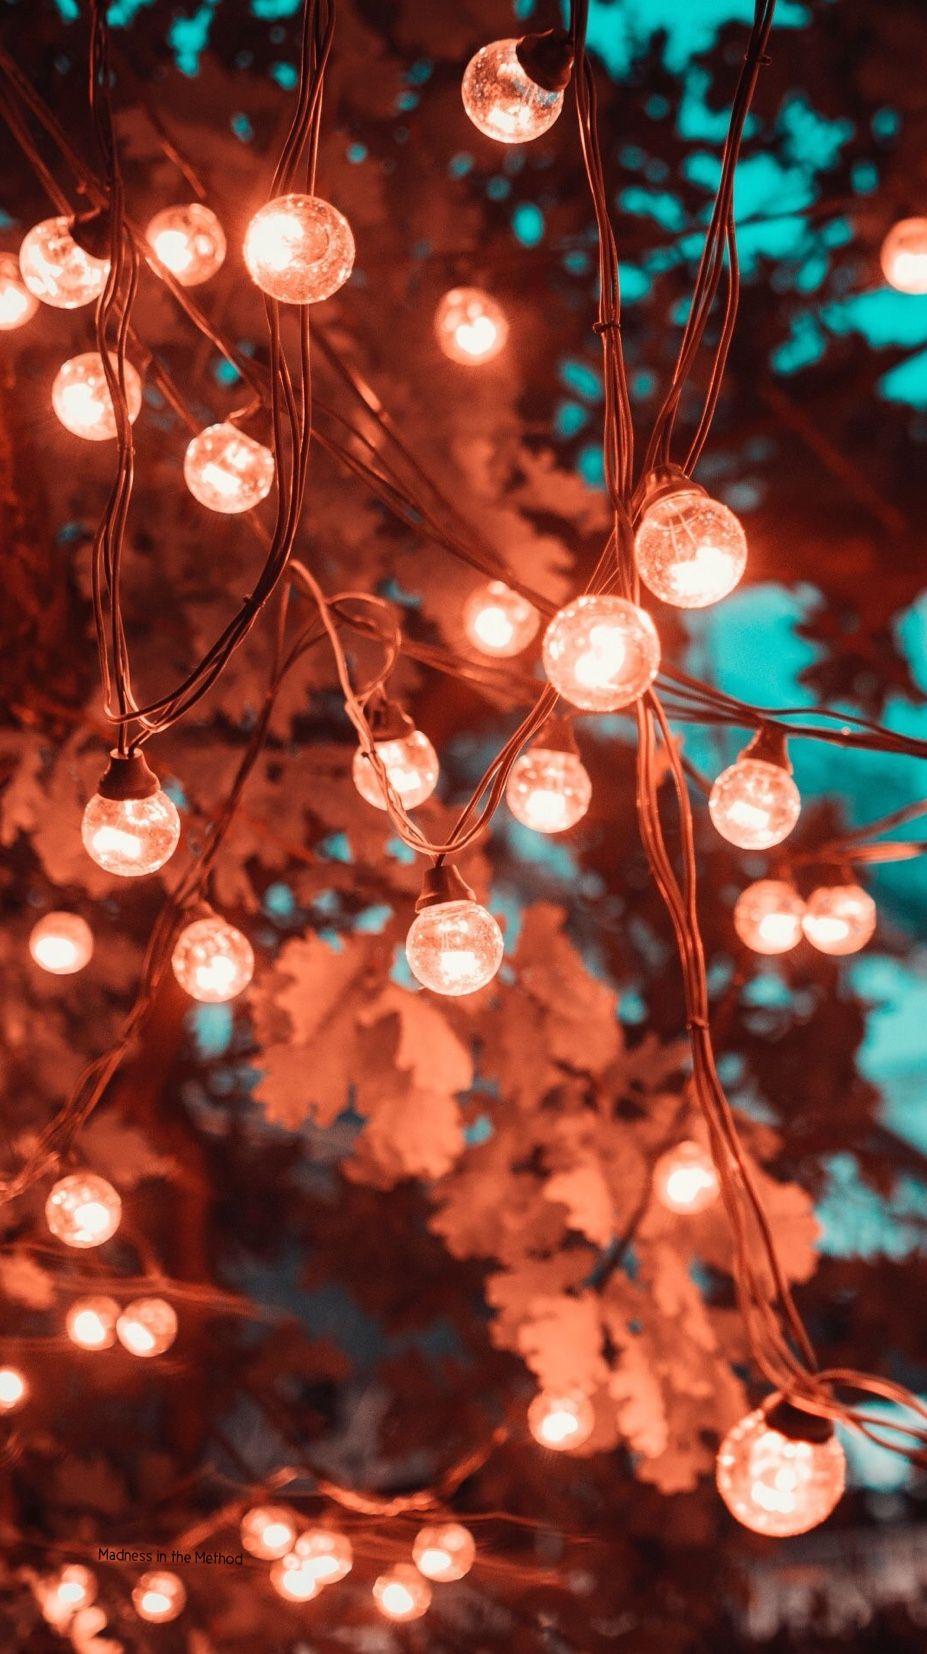 Fairylights Iphone Wallpaper Lights Christmas Phone Wallpaper Christmas Lights Wallpaper